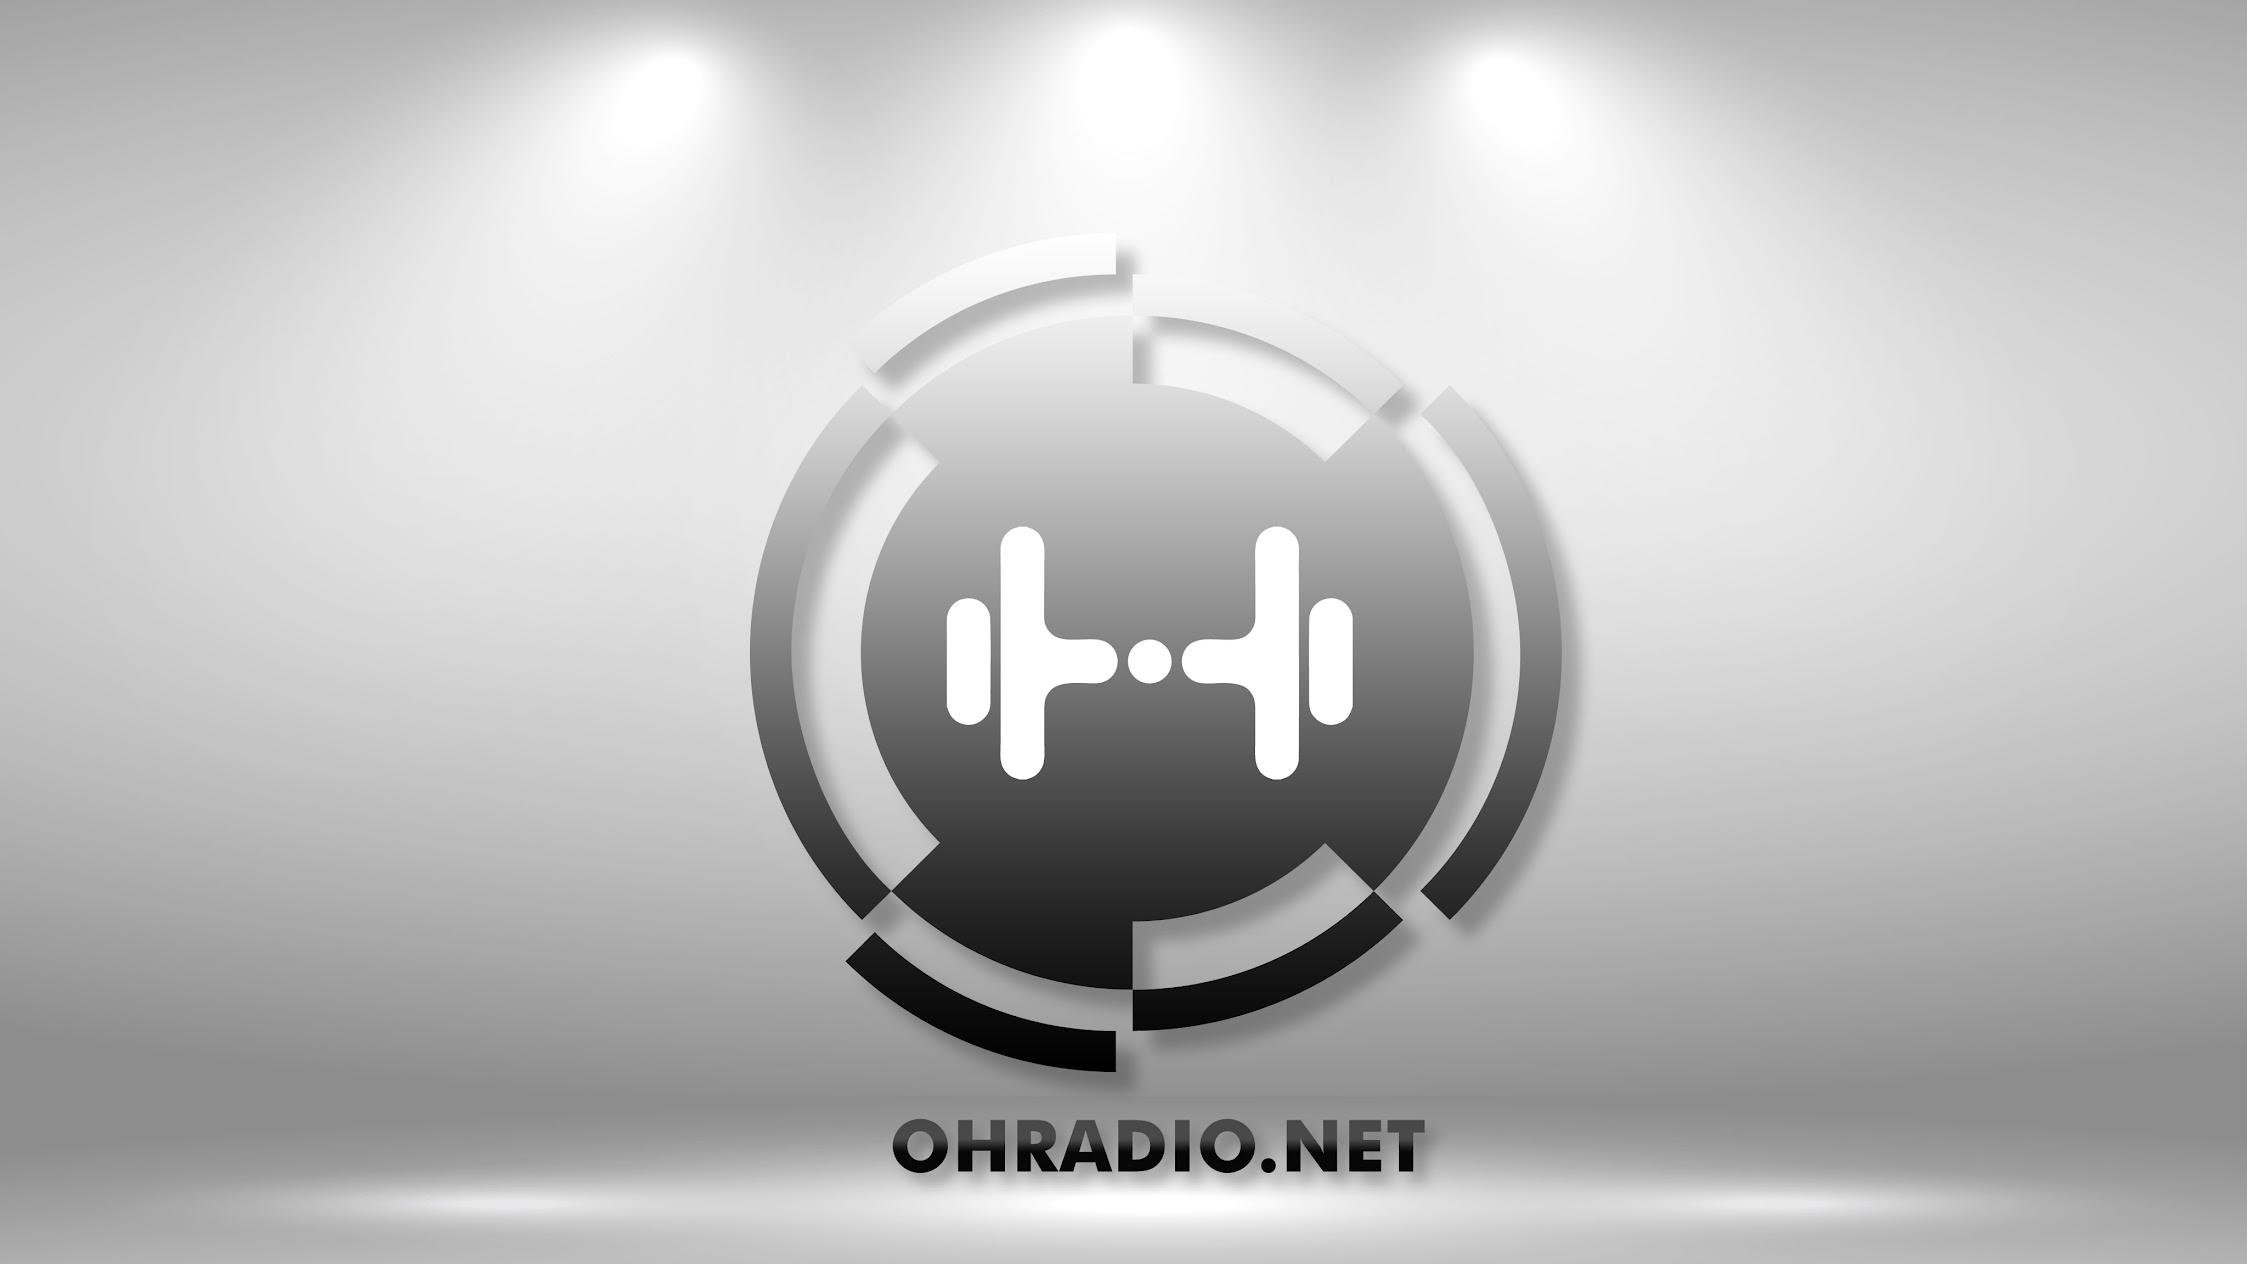 OHRADIO.NET